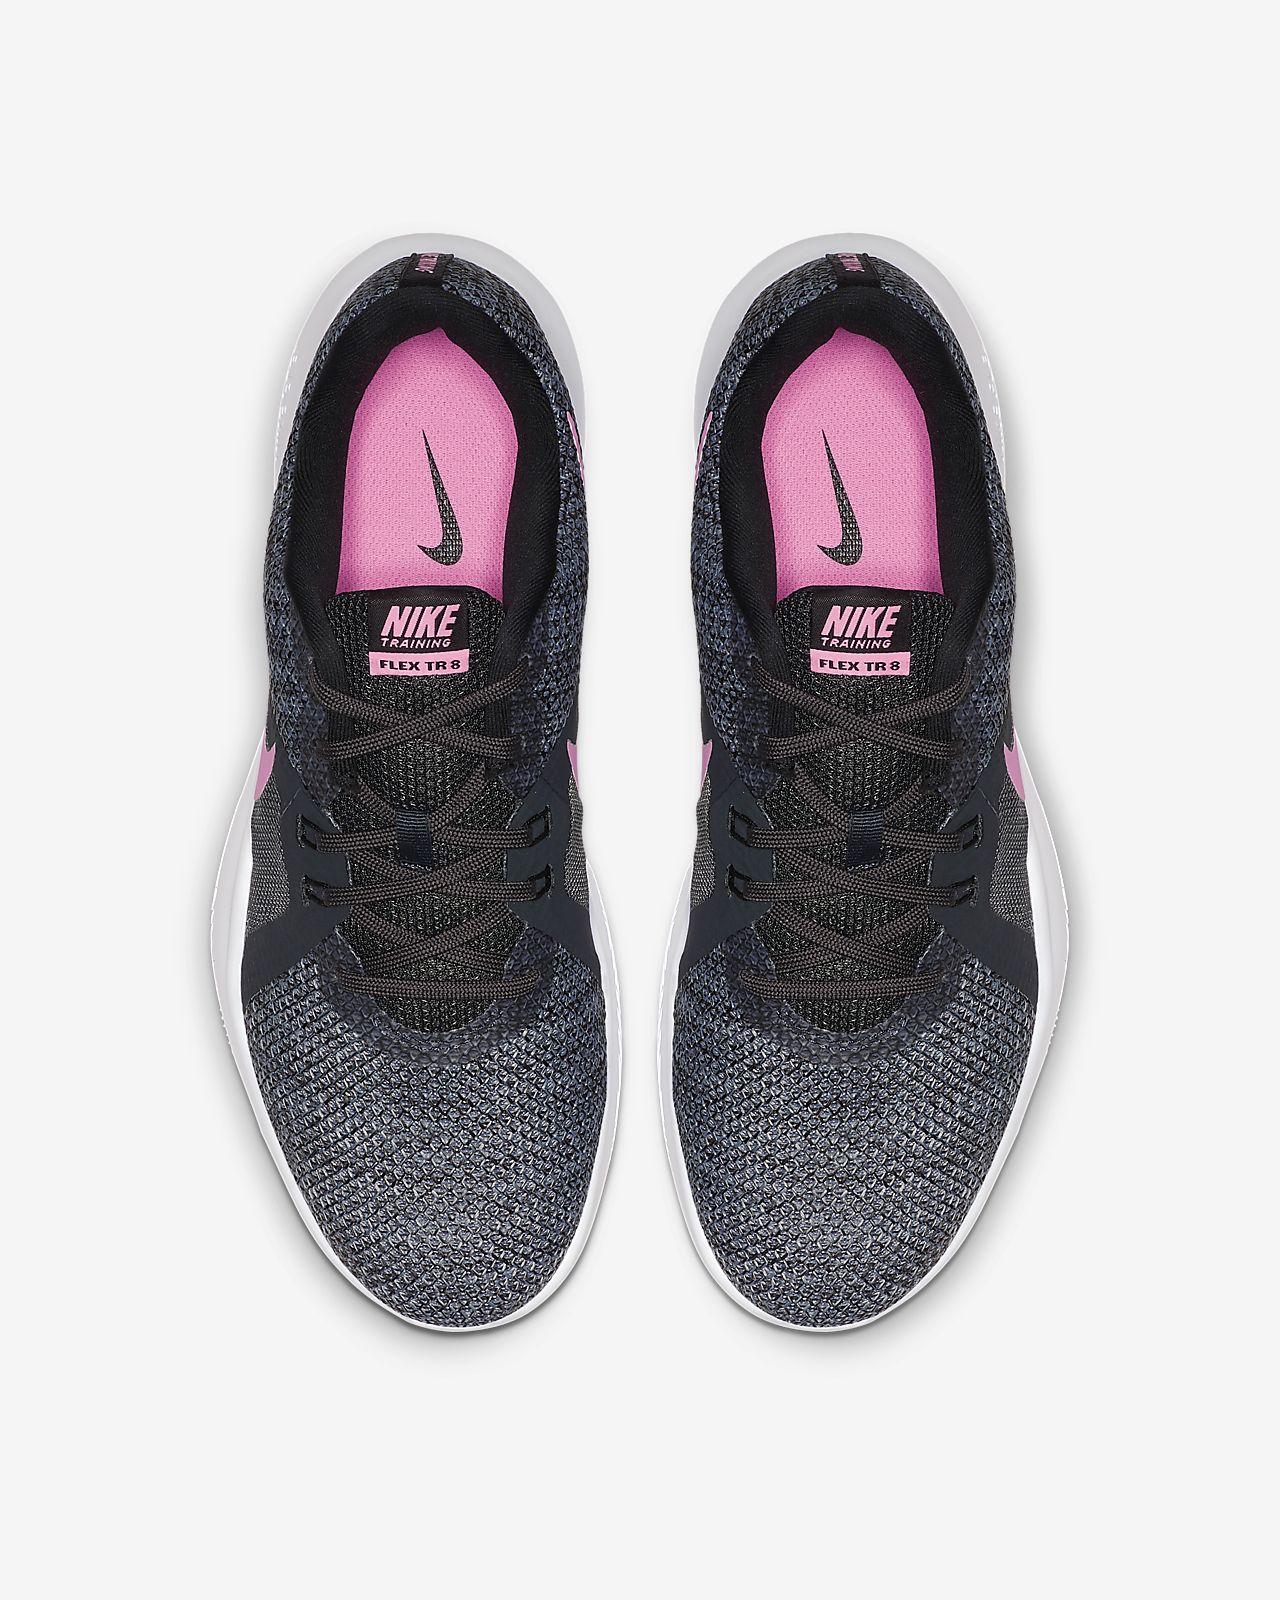 buy popular 1cede 0c3c7 ... Nike Flex TR8 Women s Training Shoe